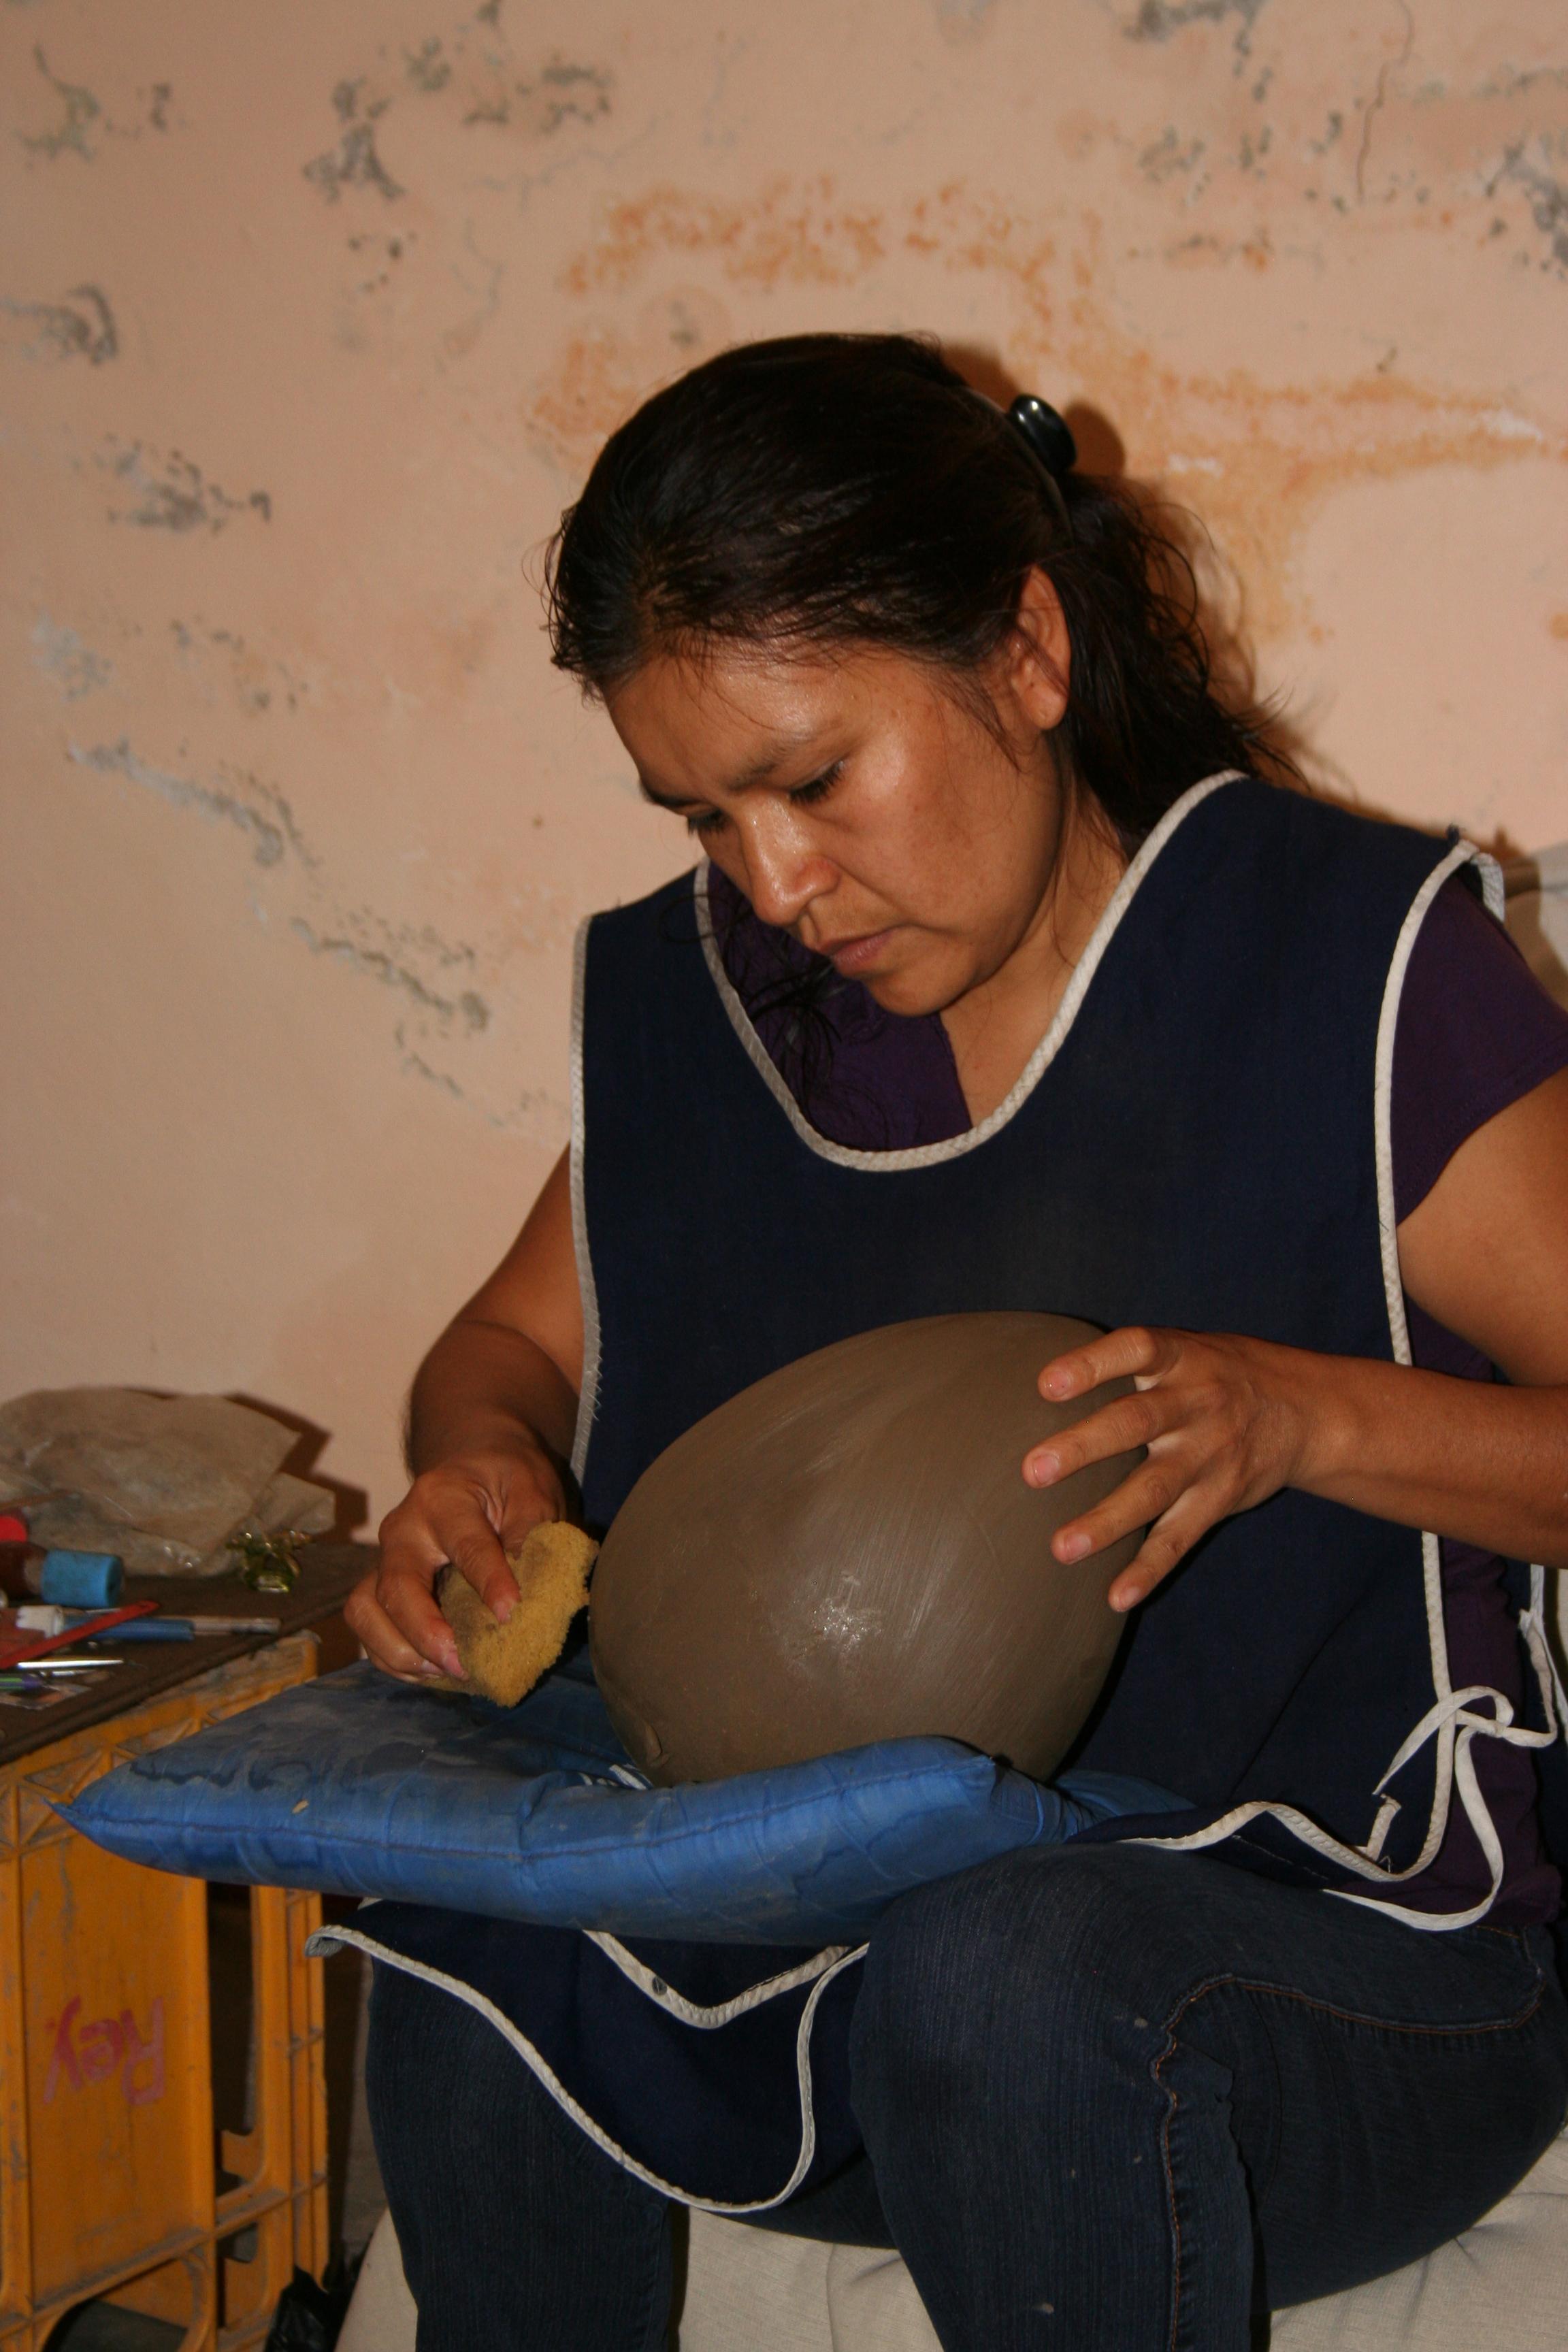 poterie-noire-oaxaca-amadera